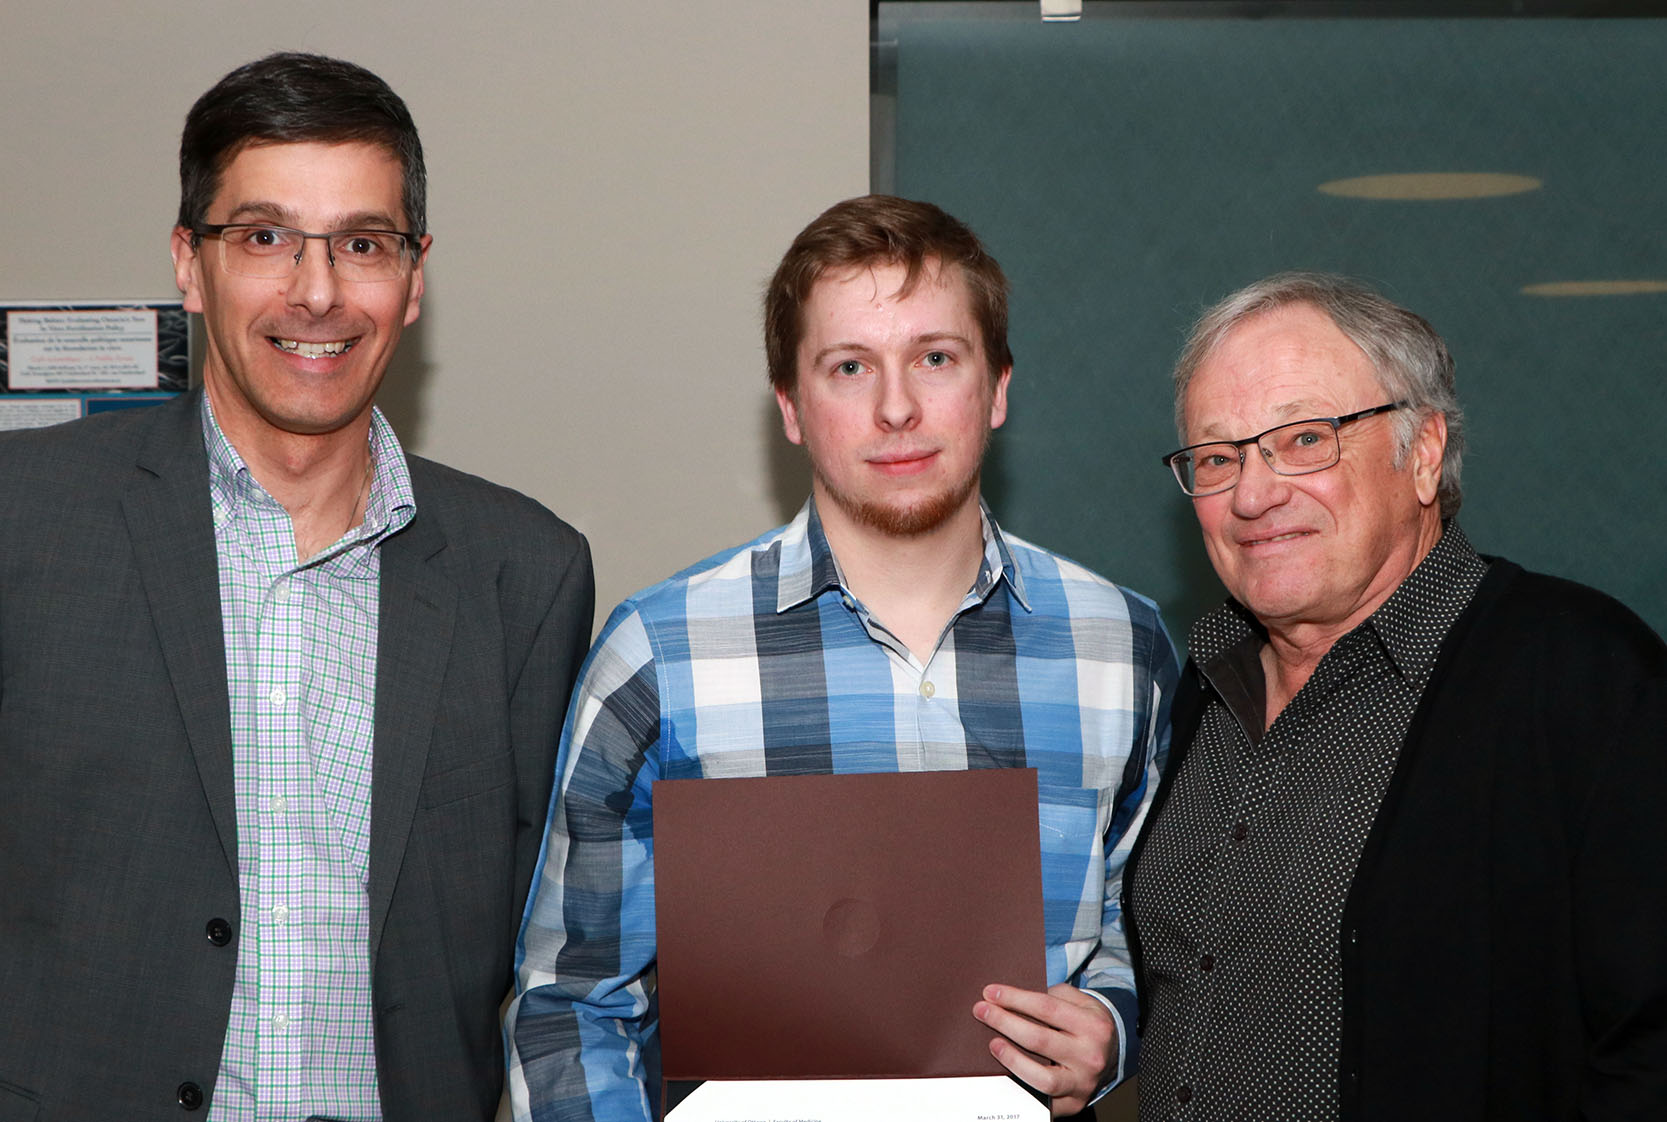 Dr. Figeys, Matt Michalicka and Dr. Korneluk